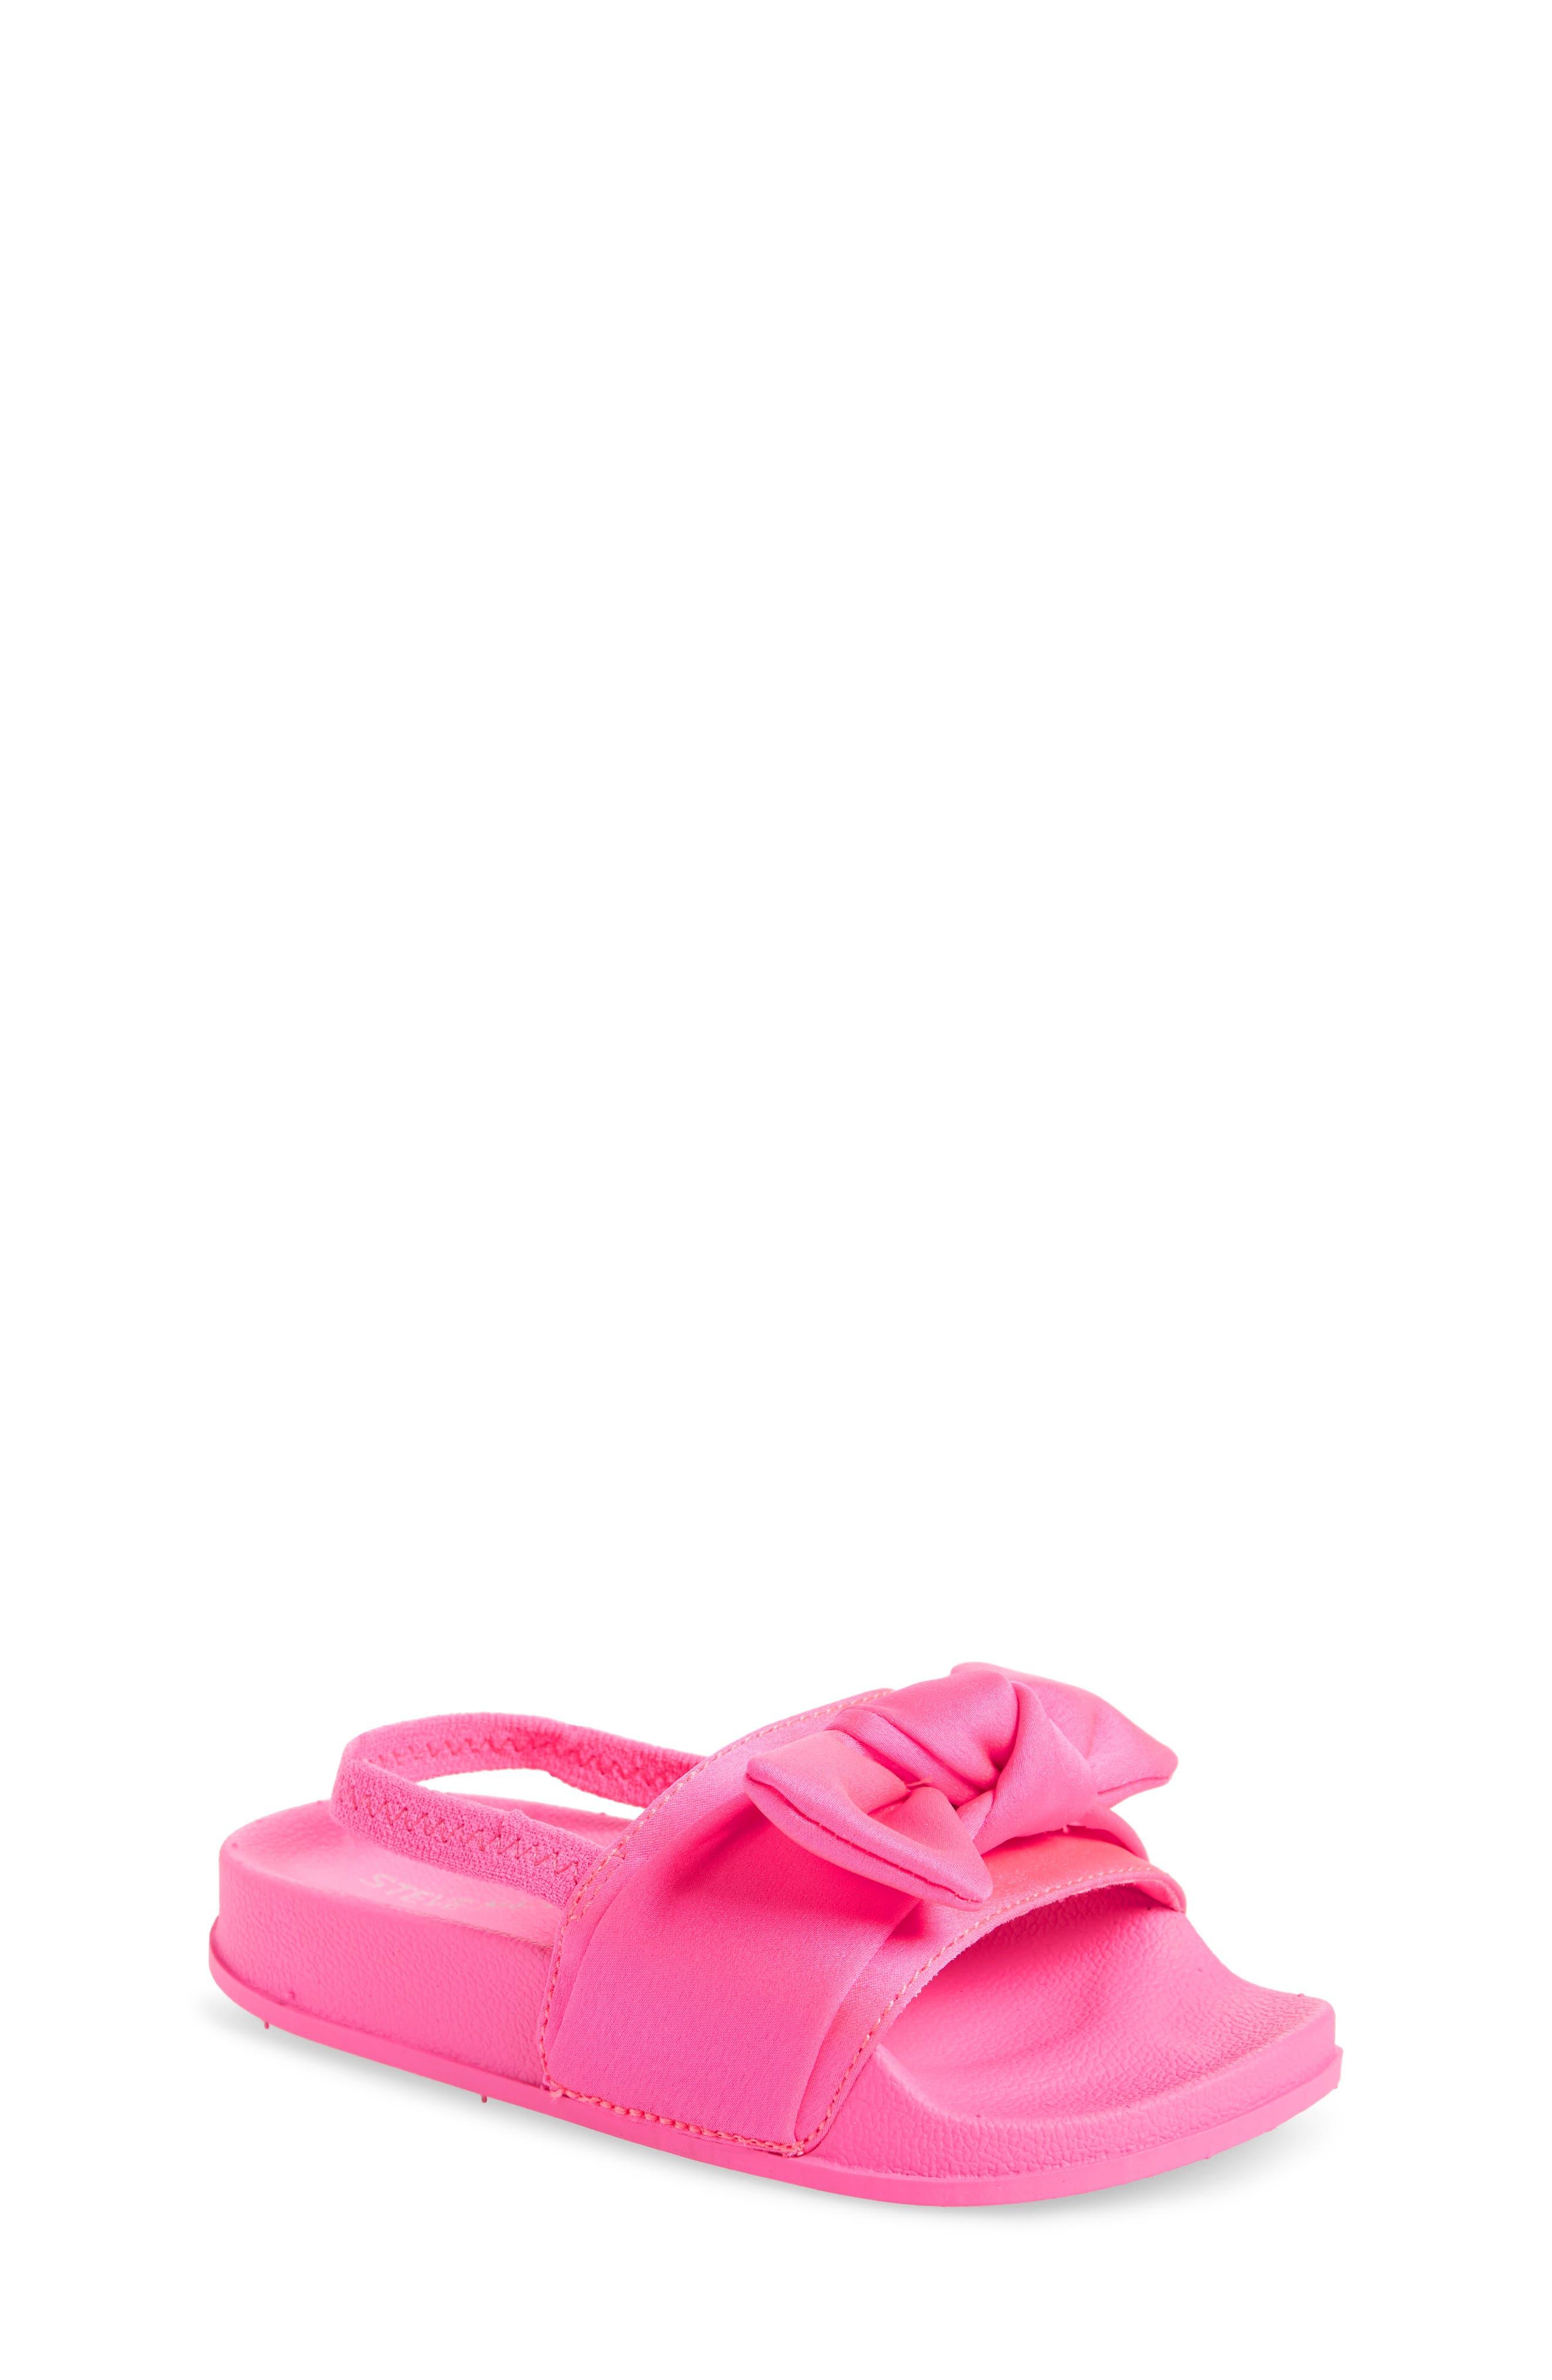 Tsilky Knotted Slide Sandal,                             Main thumbnail 4, color,